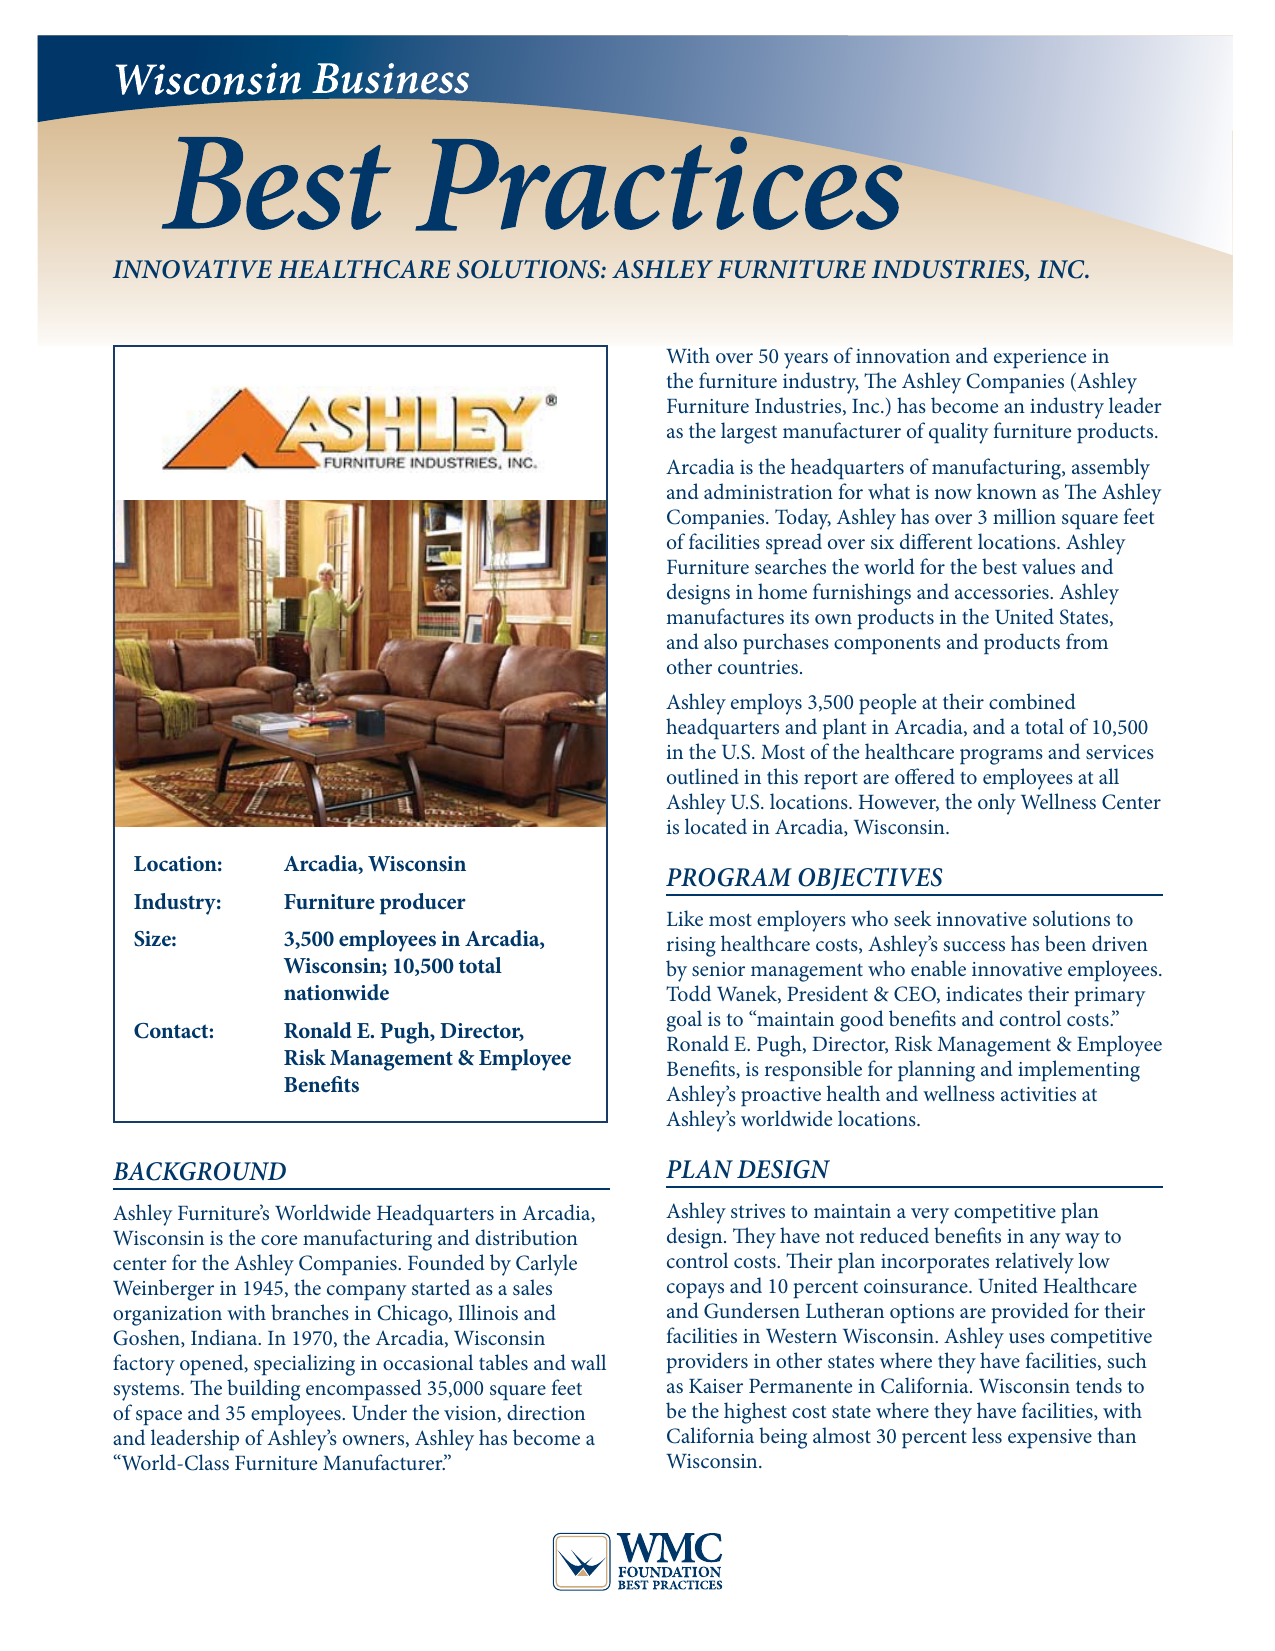 Ashley Furniture   Wisconsin Manufacturers U0026 Commerce